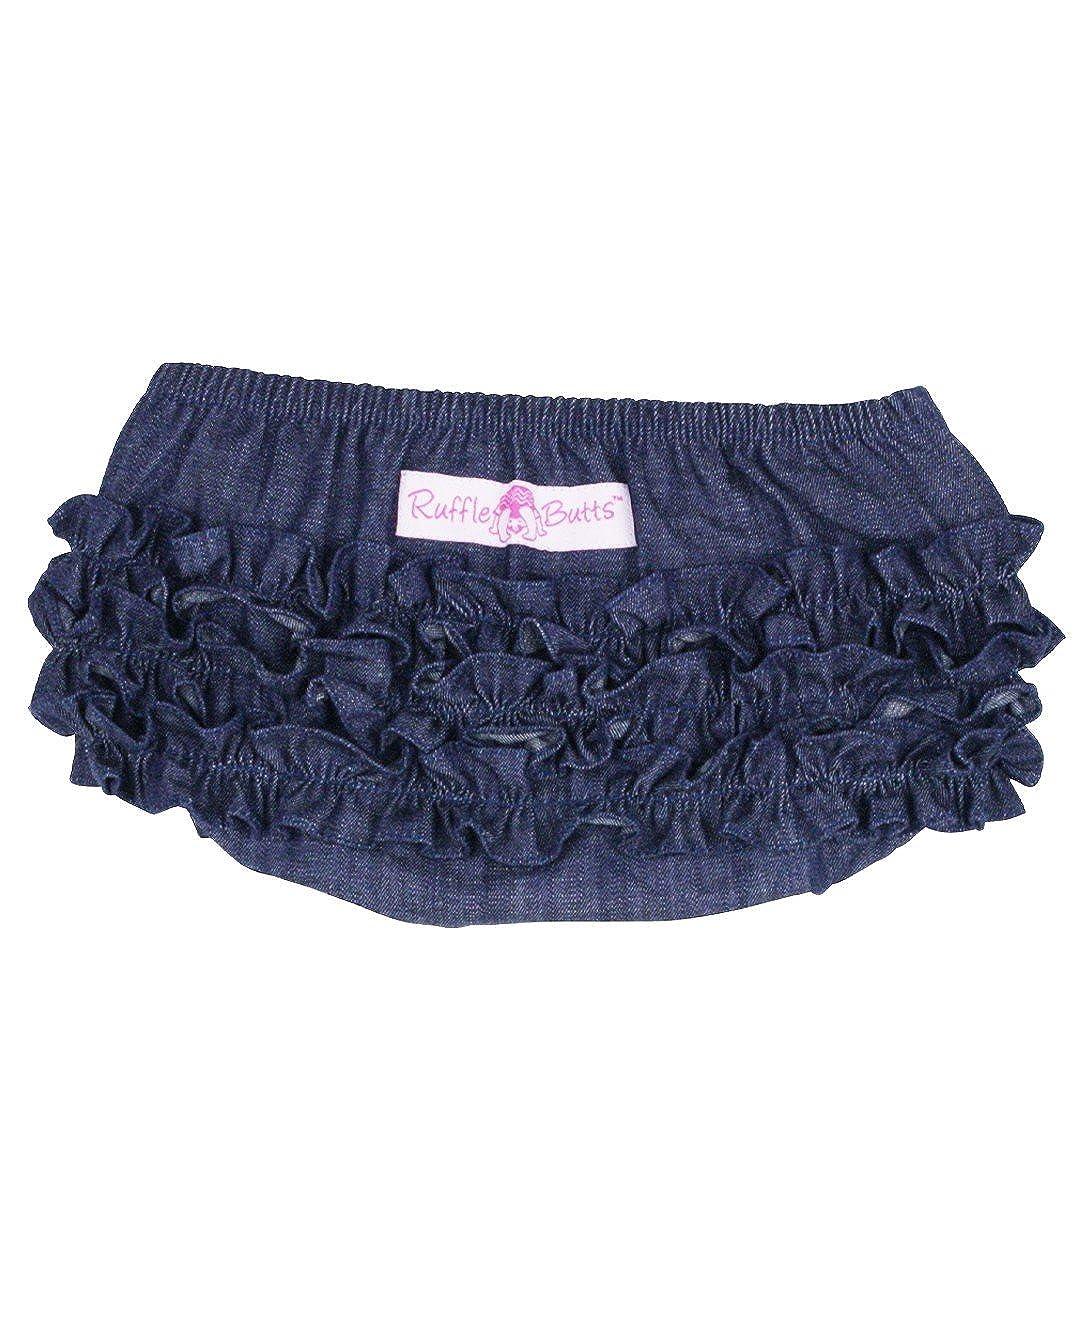 RuffleButts Baby//Toddler Girls Denim Ruffled Diaper Cover Bloomer RBDYYXX-0000-SC-BABY